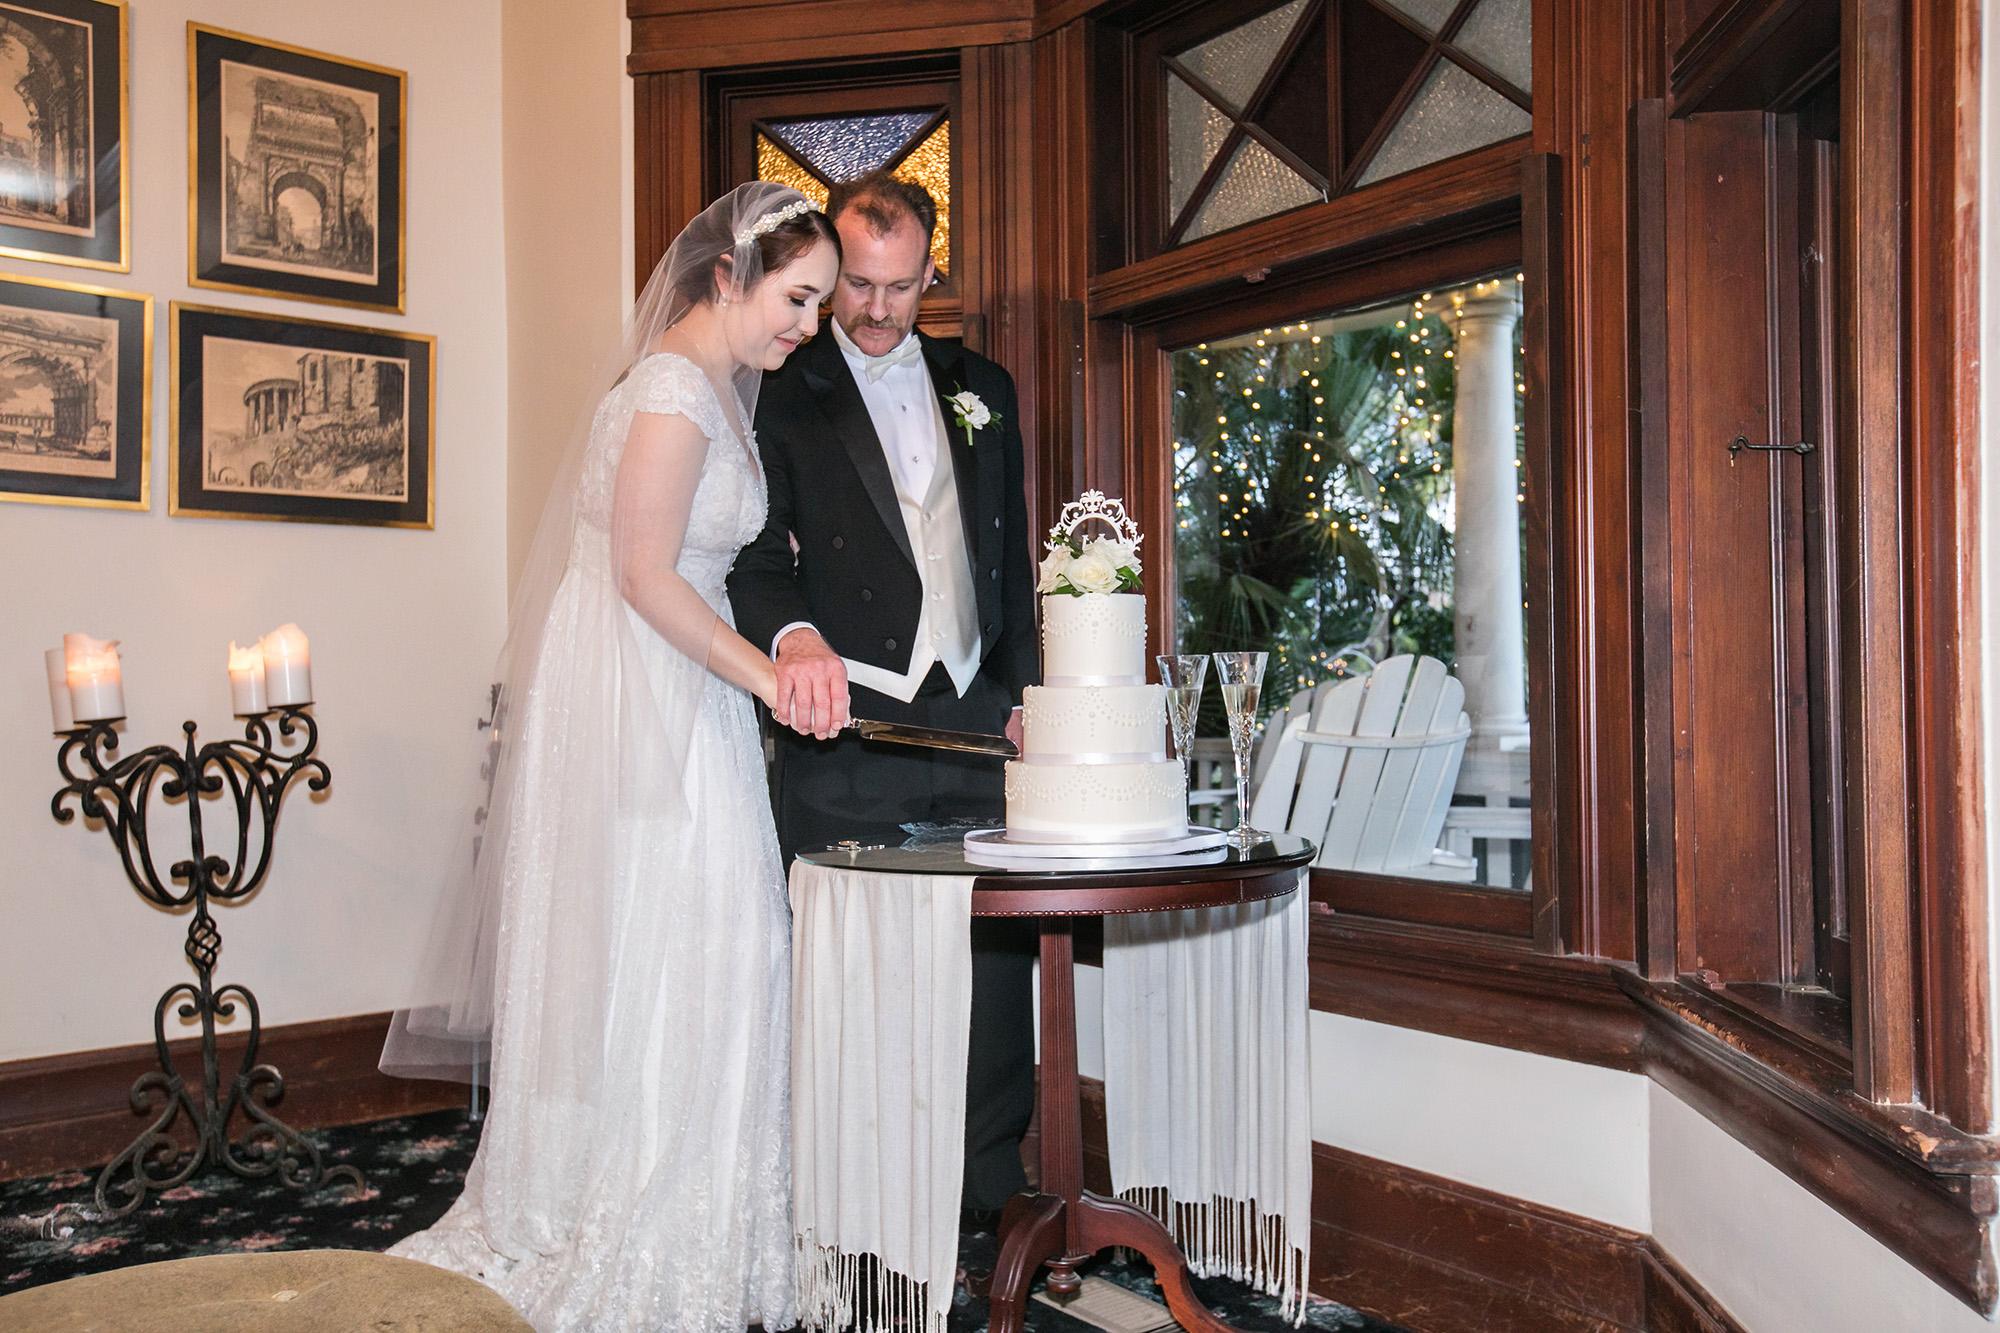 vintage-inspired-christmas-house-wedding-carrie-vines-087.jpg